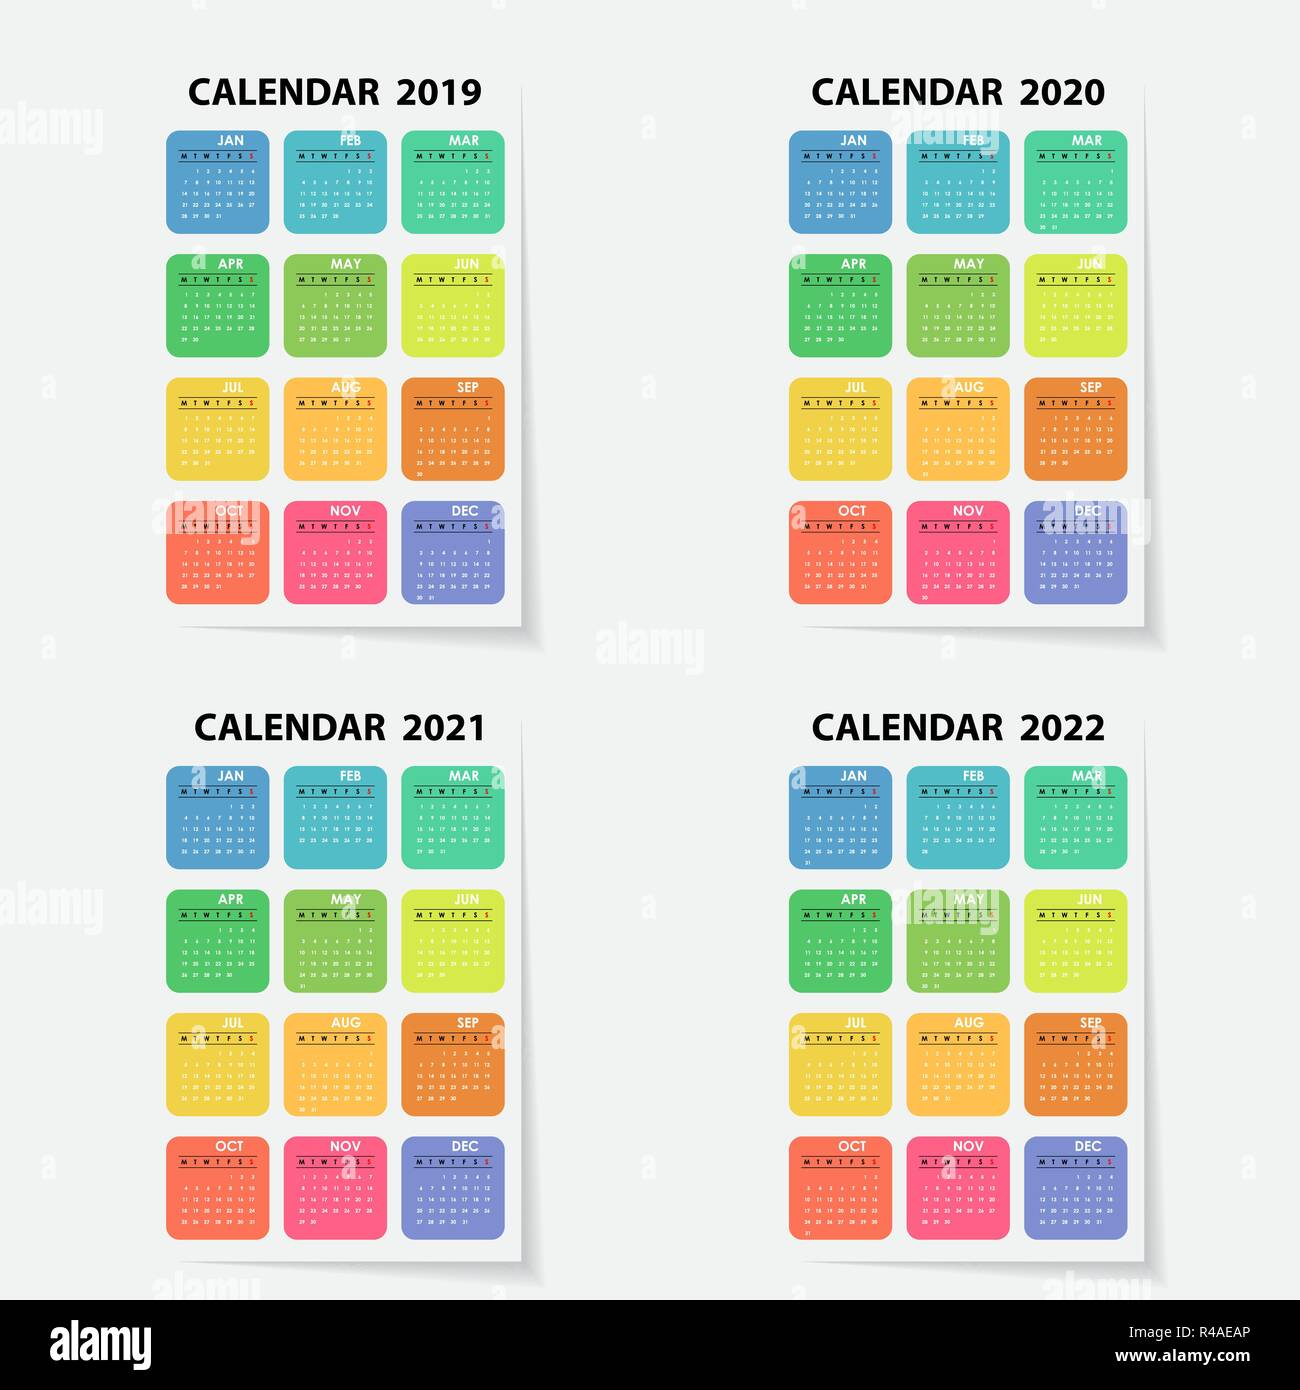 Calendario Annuale 2020.Il Calendario 2019 2020 2021 E 2022 Modello Calendario